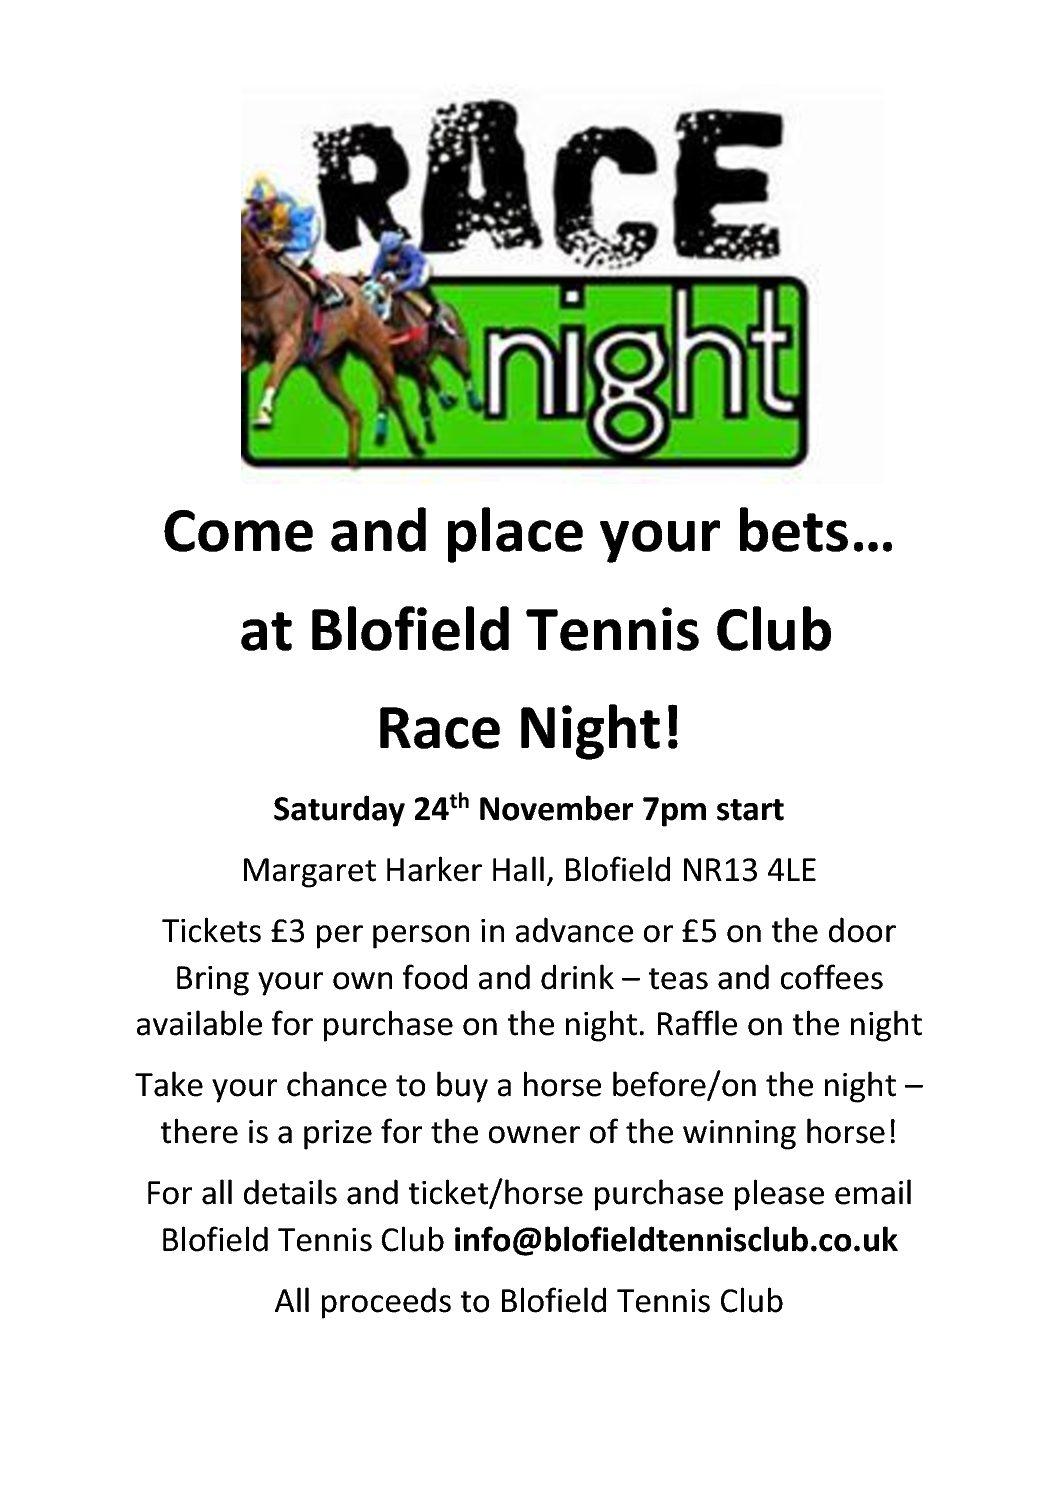 BLOFIELD TENNIS CLUB RACE NIGHT